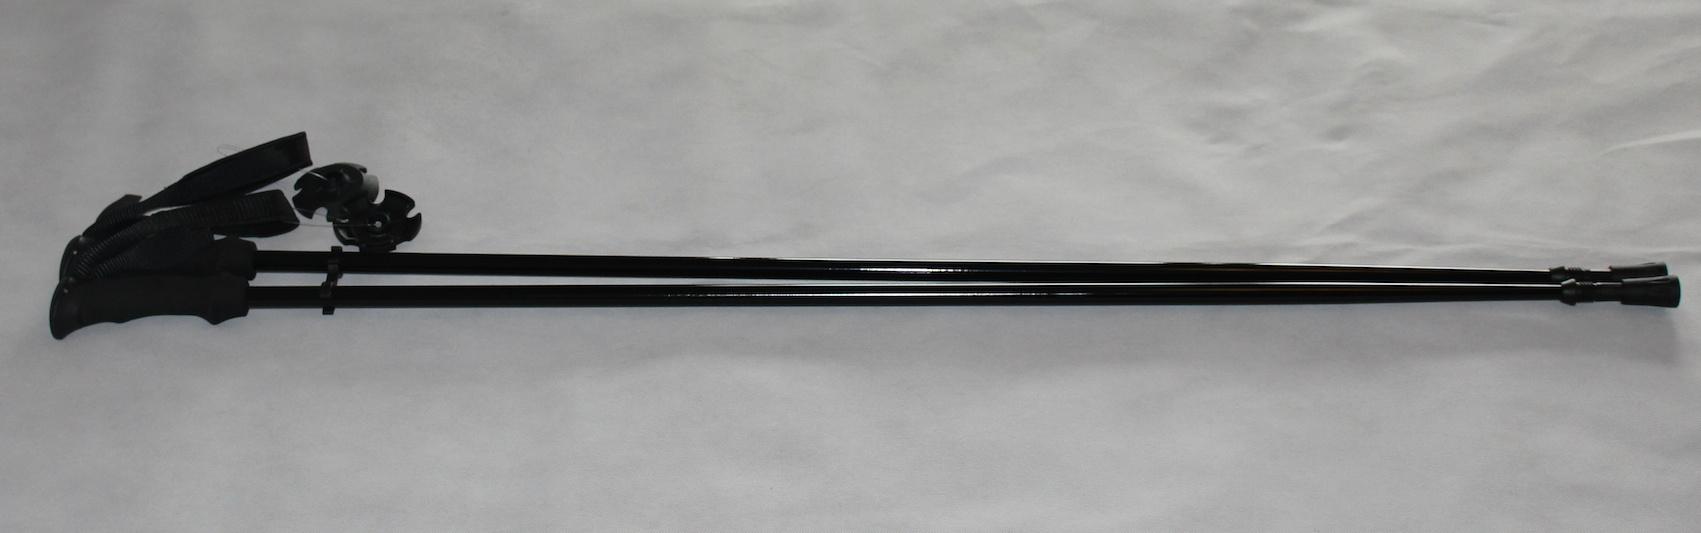 100% Carbon EVA Grip Colorful Ski Pole (MW2017)